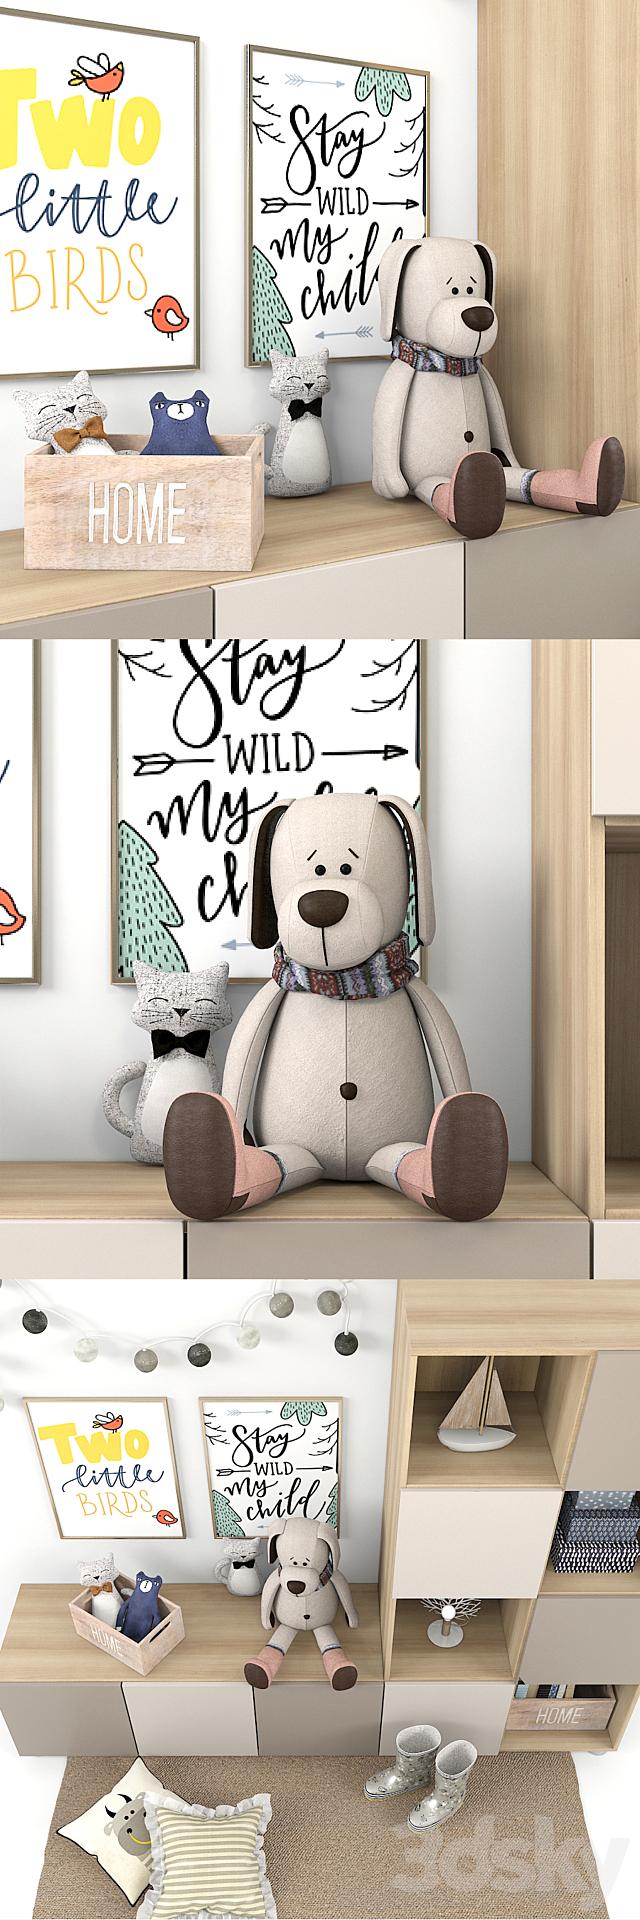 Children's furniture and accessories 44